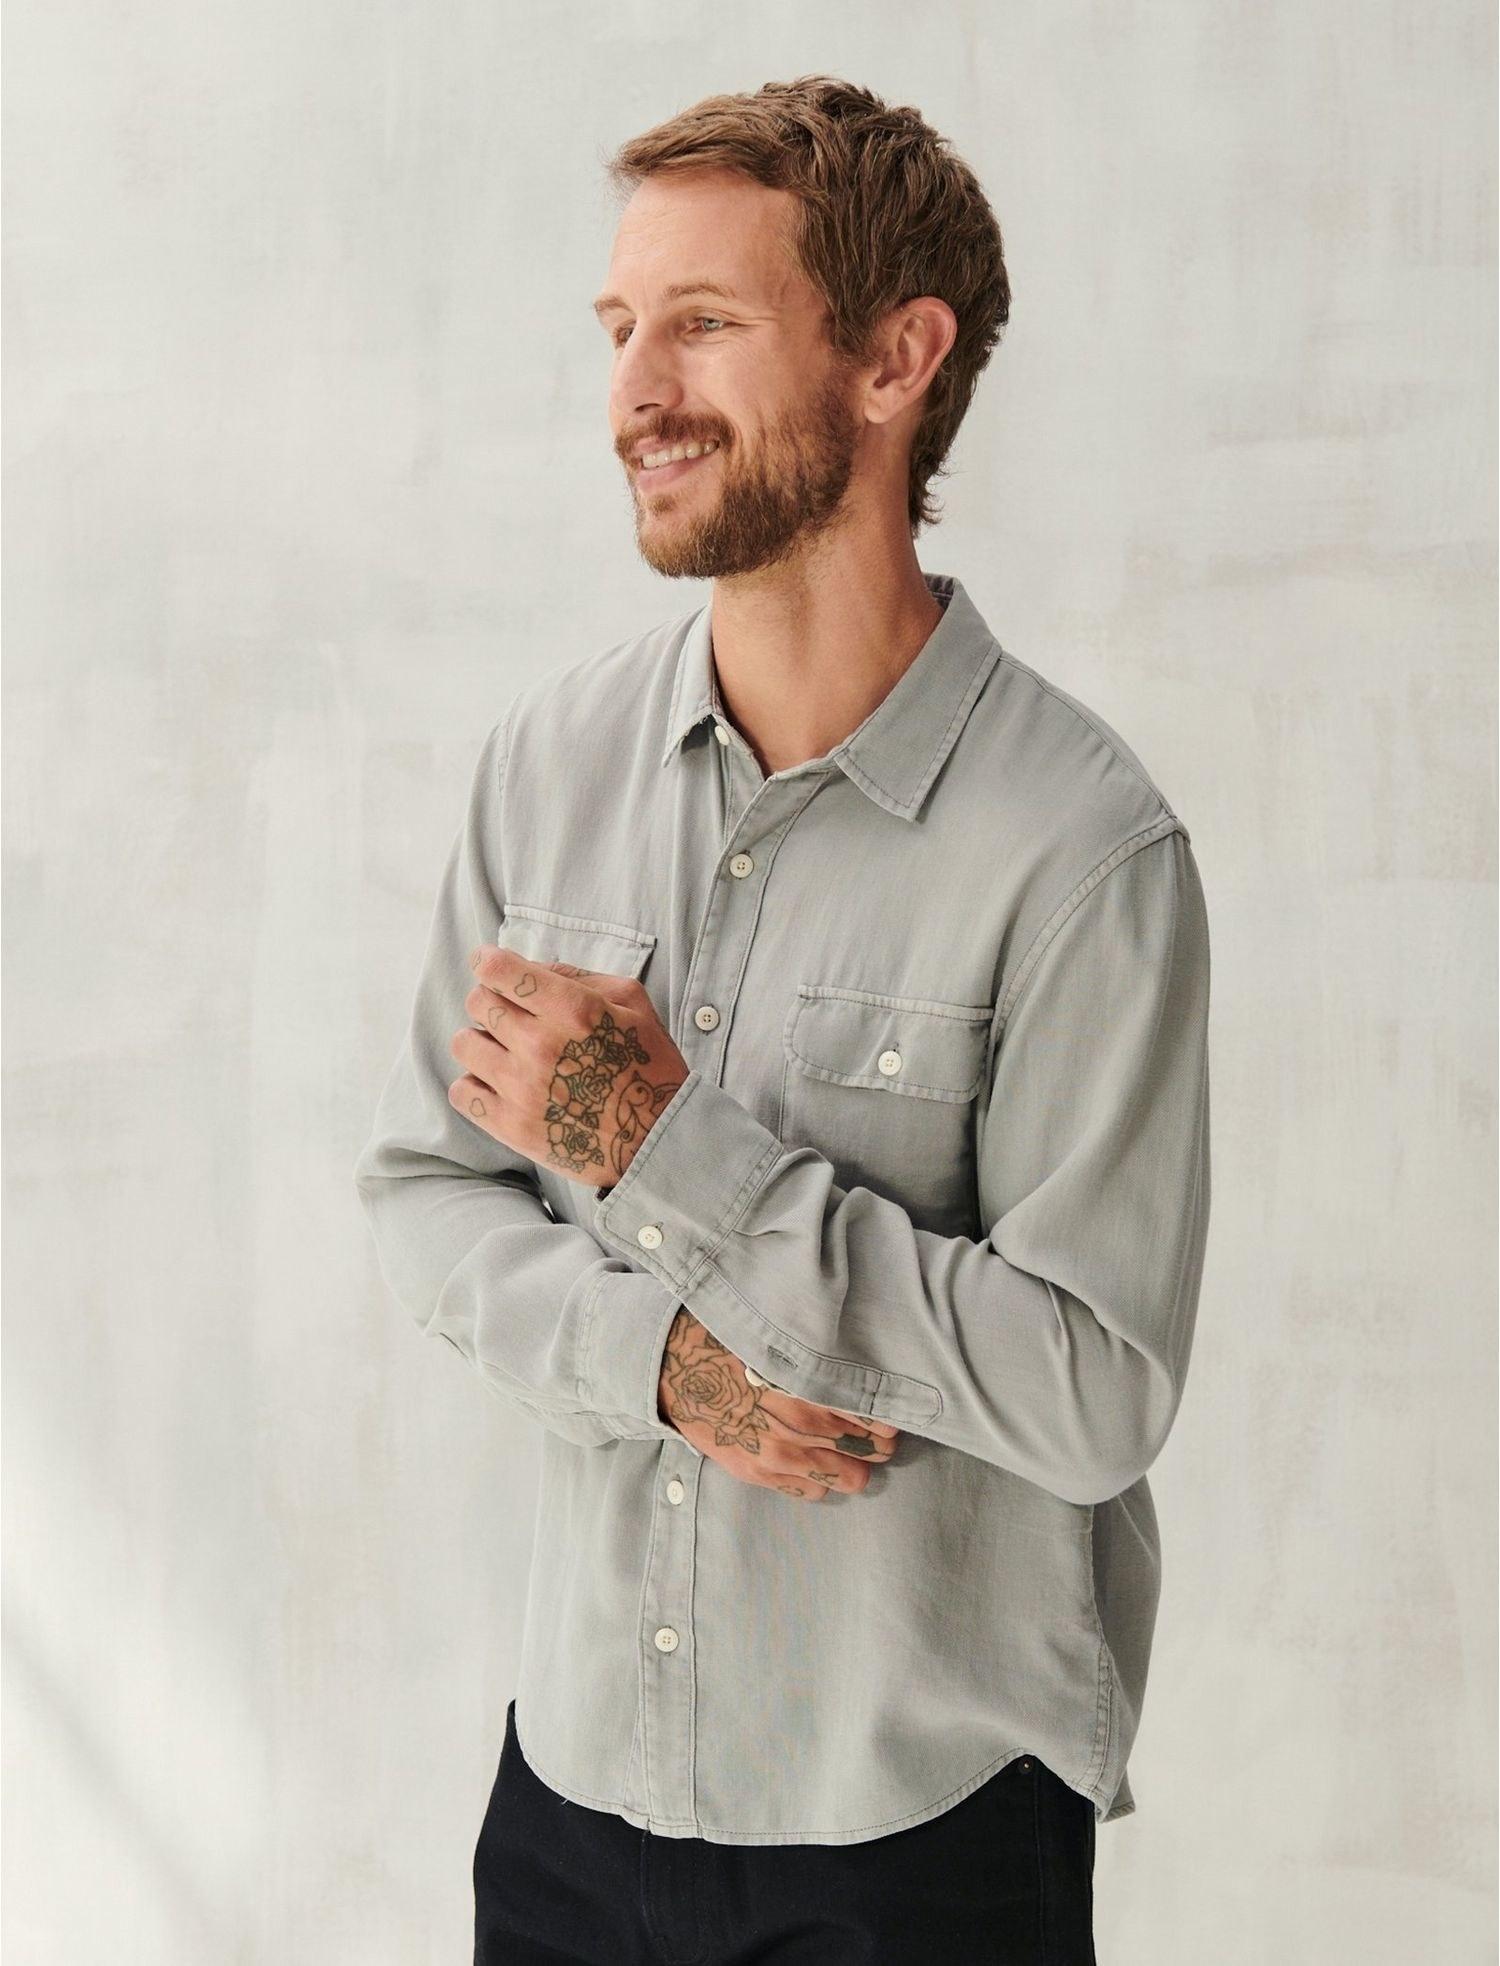 Model wearing a button-down shirt in grey